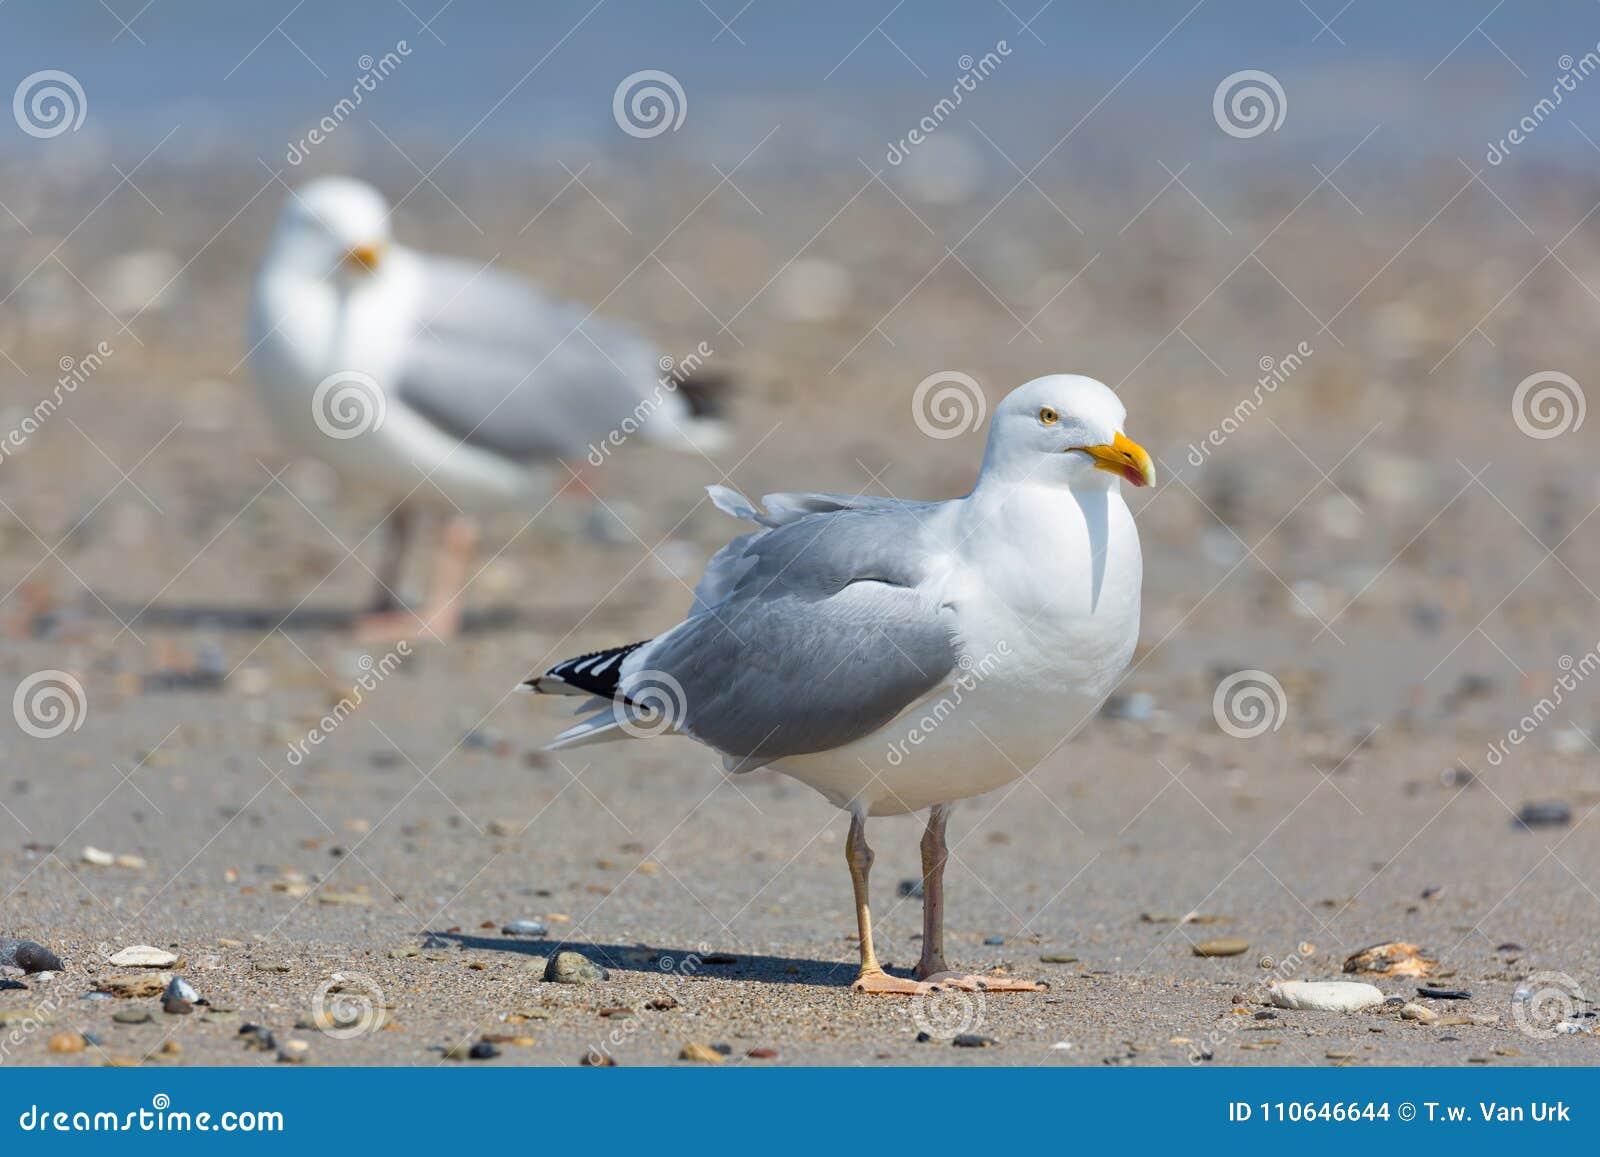 Herring gull at beach of German island Dune near Helgoland